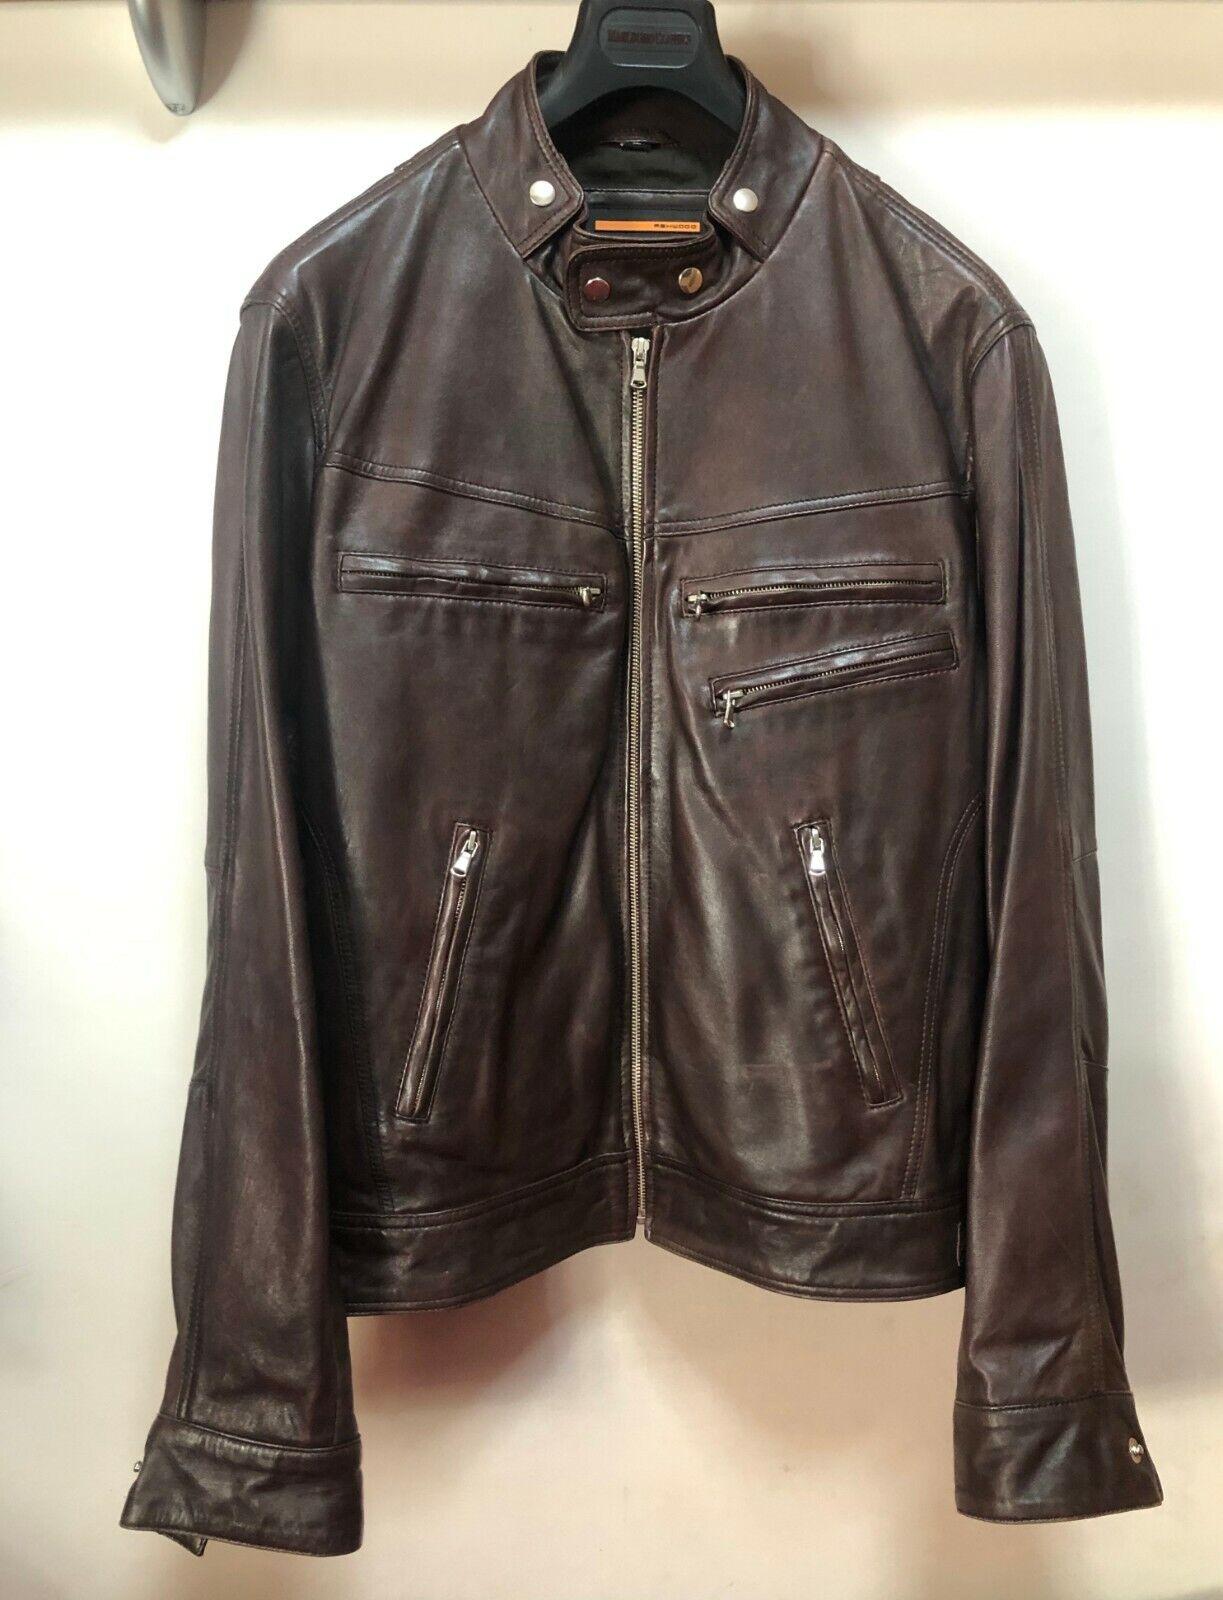 Ashwood Leather Biker Jacket Chaqueta Cazadora Cuero Moto